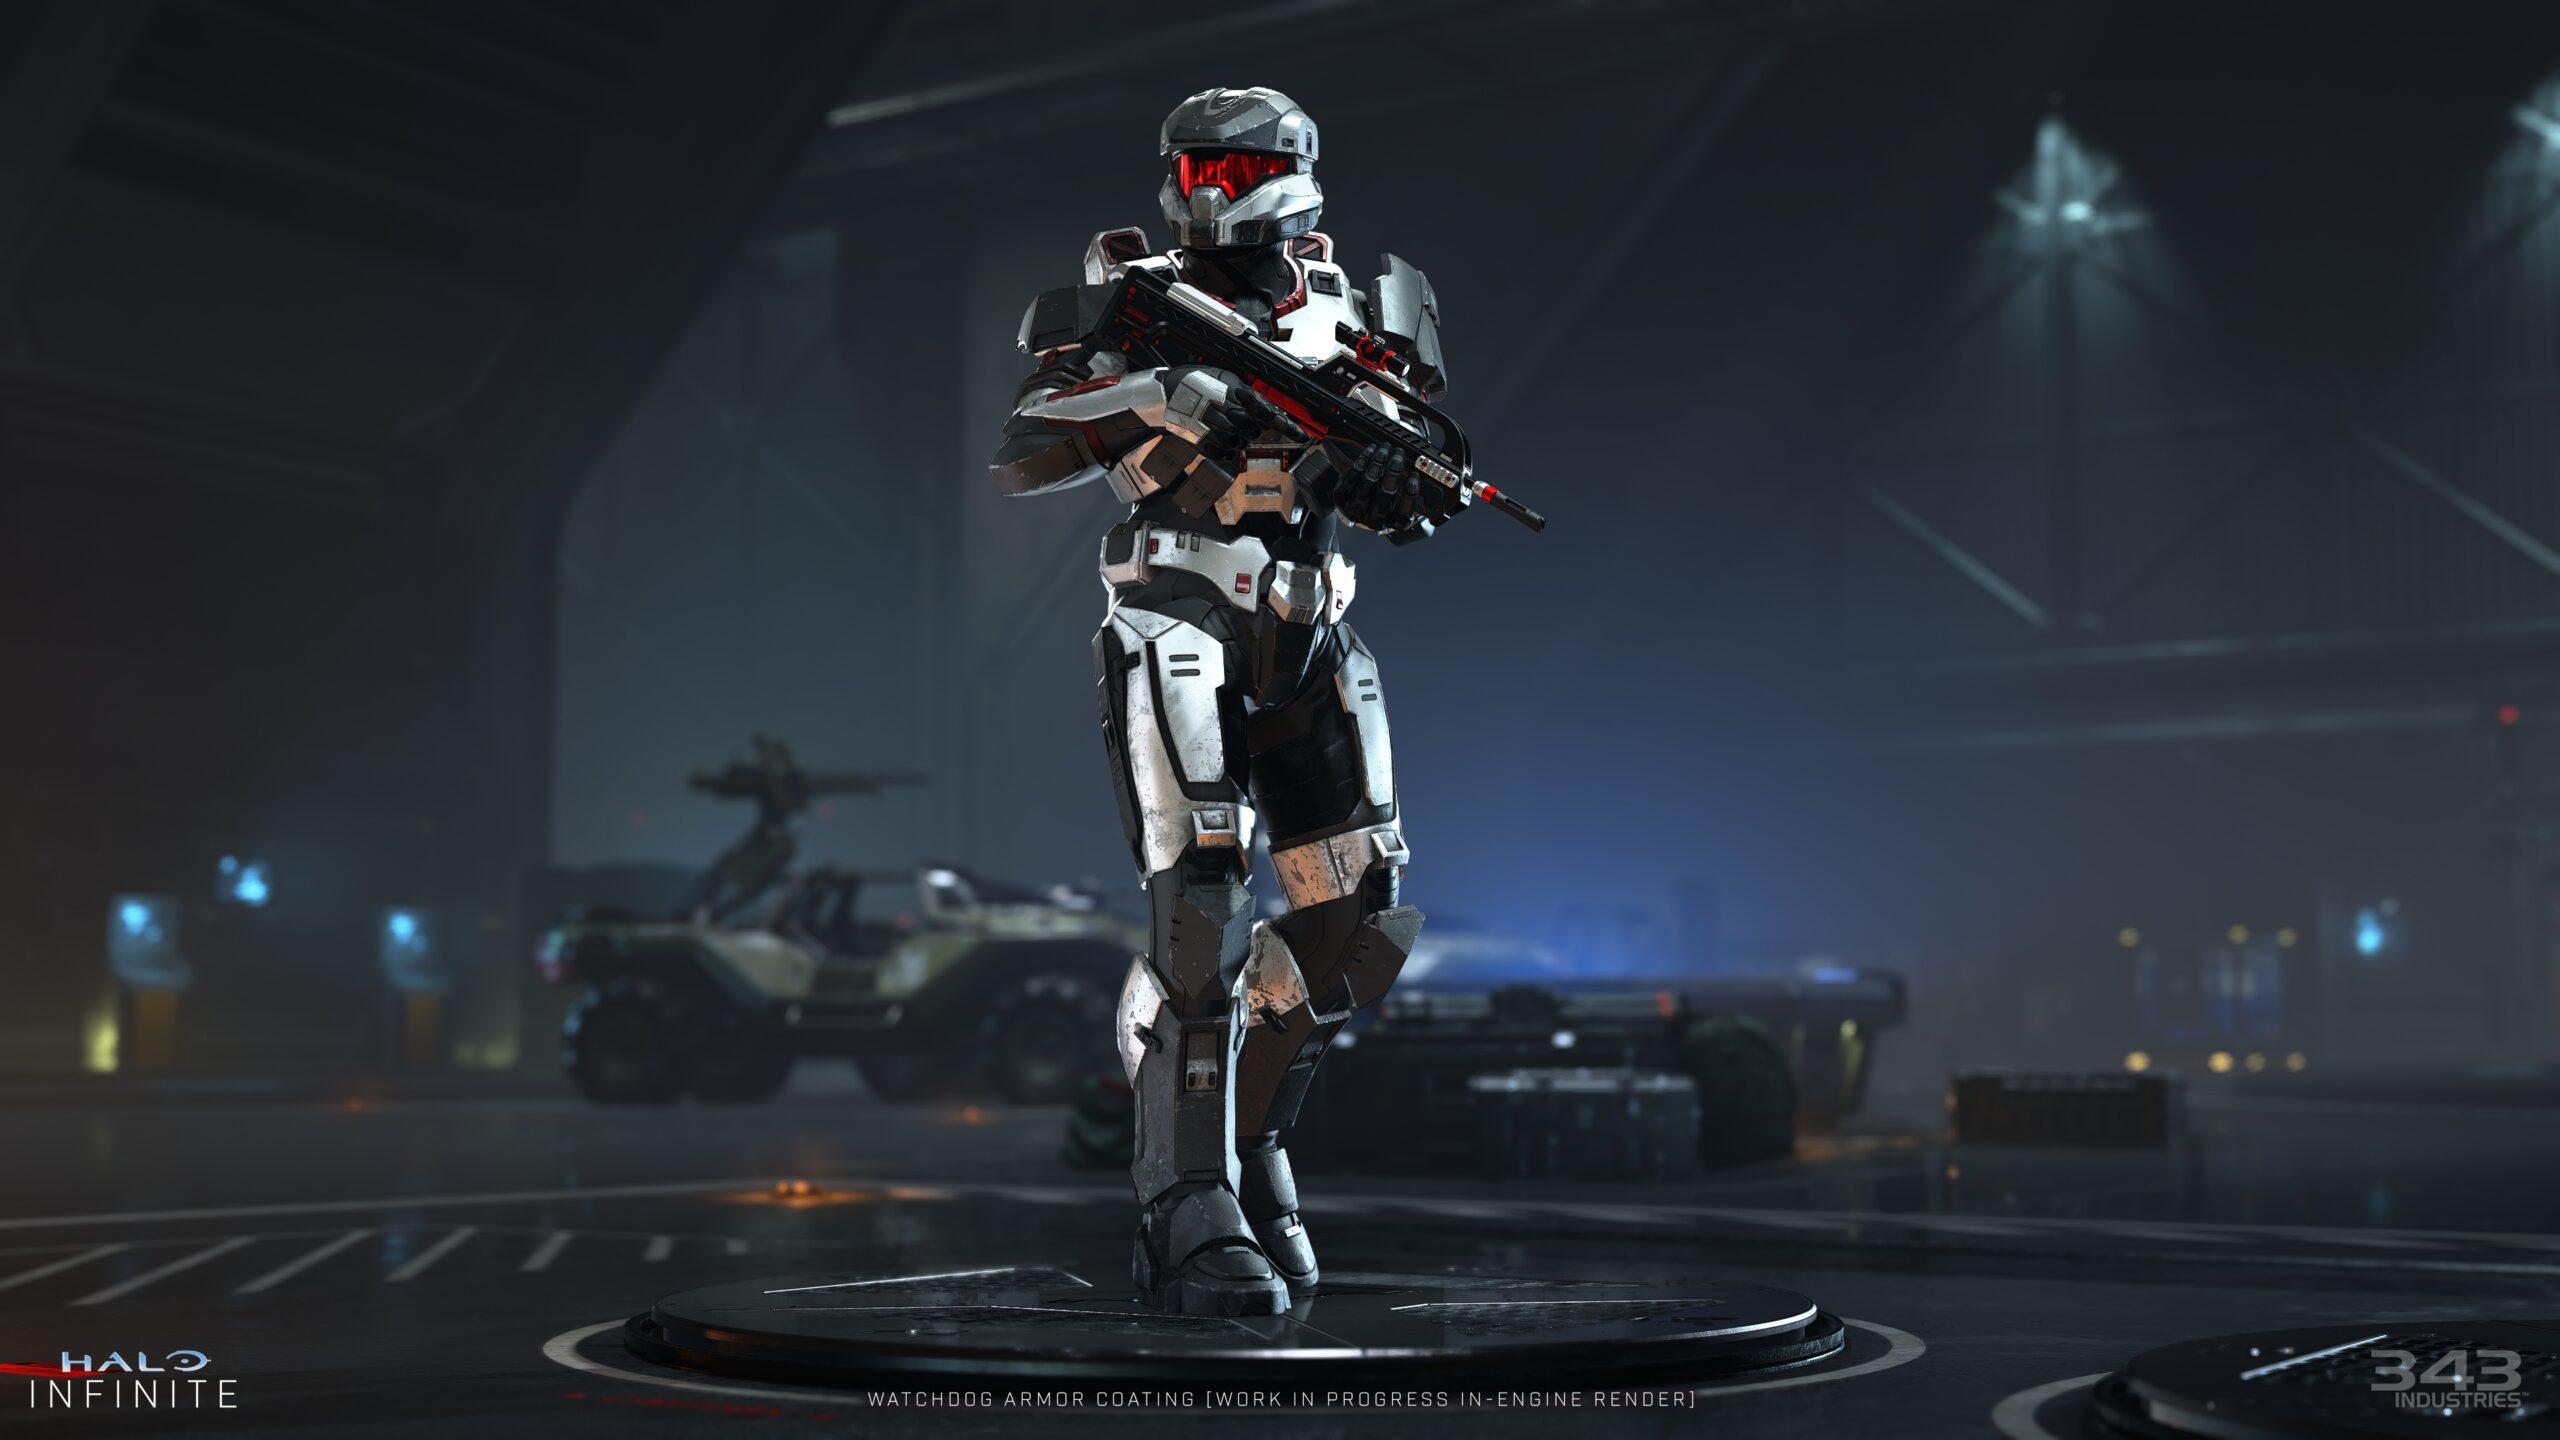 Halo-Infinite_2020_12-08-20_009